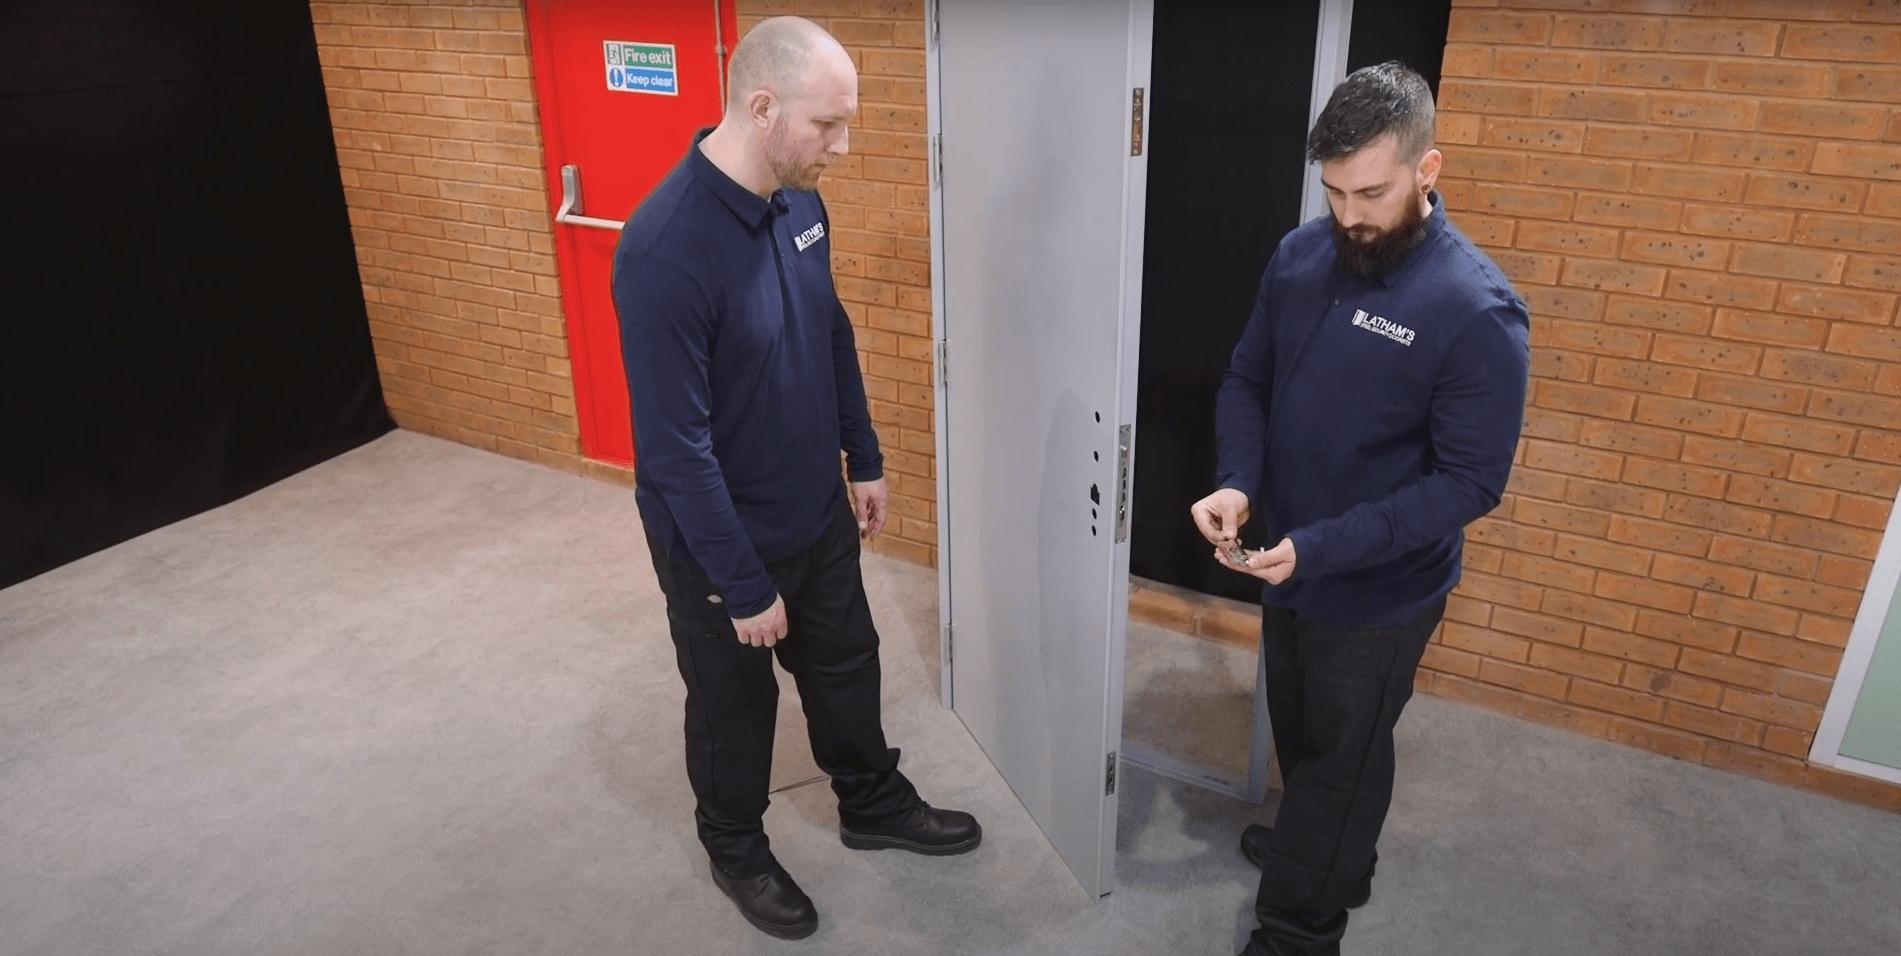 2021 06 23 14 05 51 How to Install a Steel Door Lathams Steel Security Doors YouTube | Orderwise